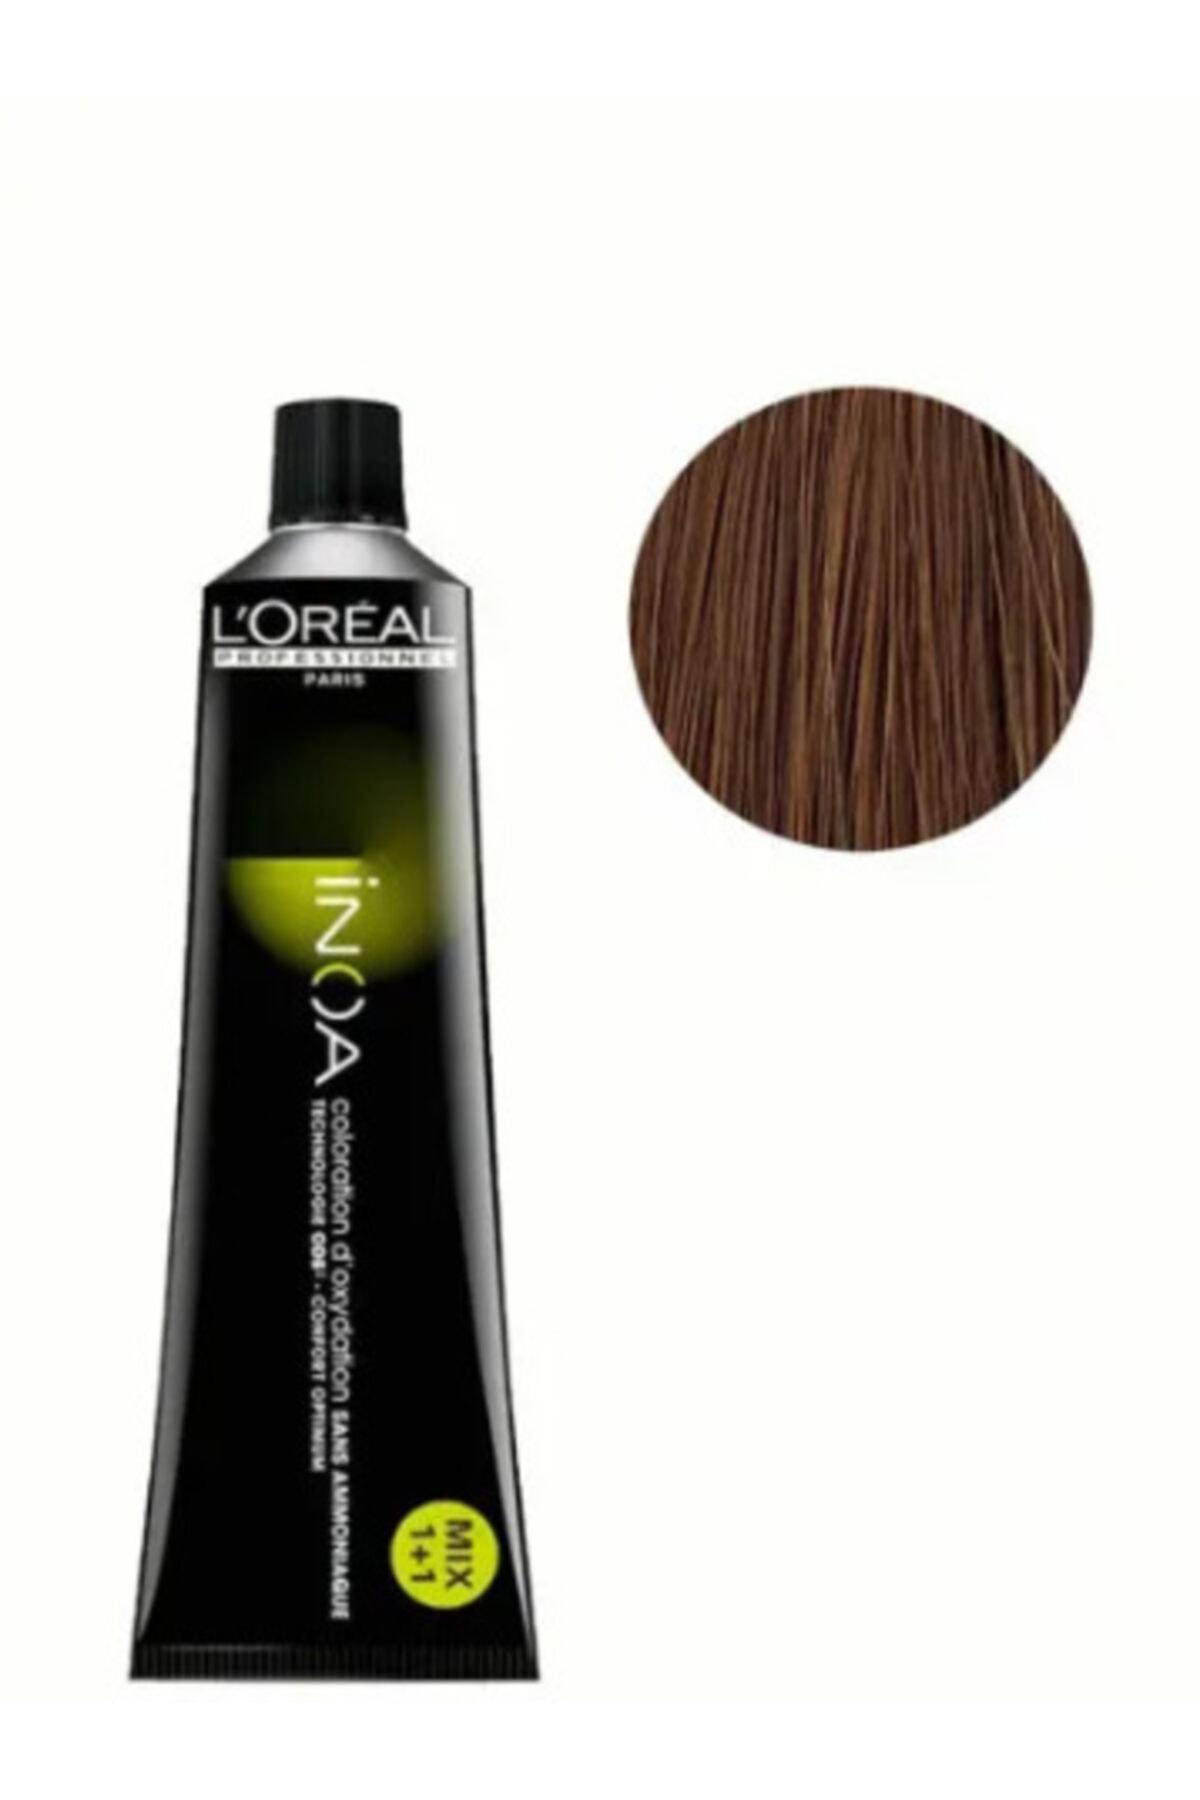 L'oreal Professionnel L'oreal Professional Inoa Saç Boyası 7,1 Renk Kumral Küllü 1